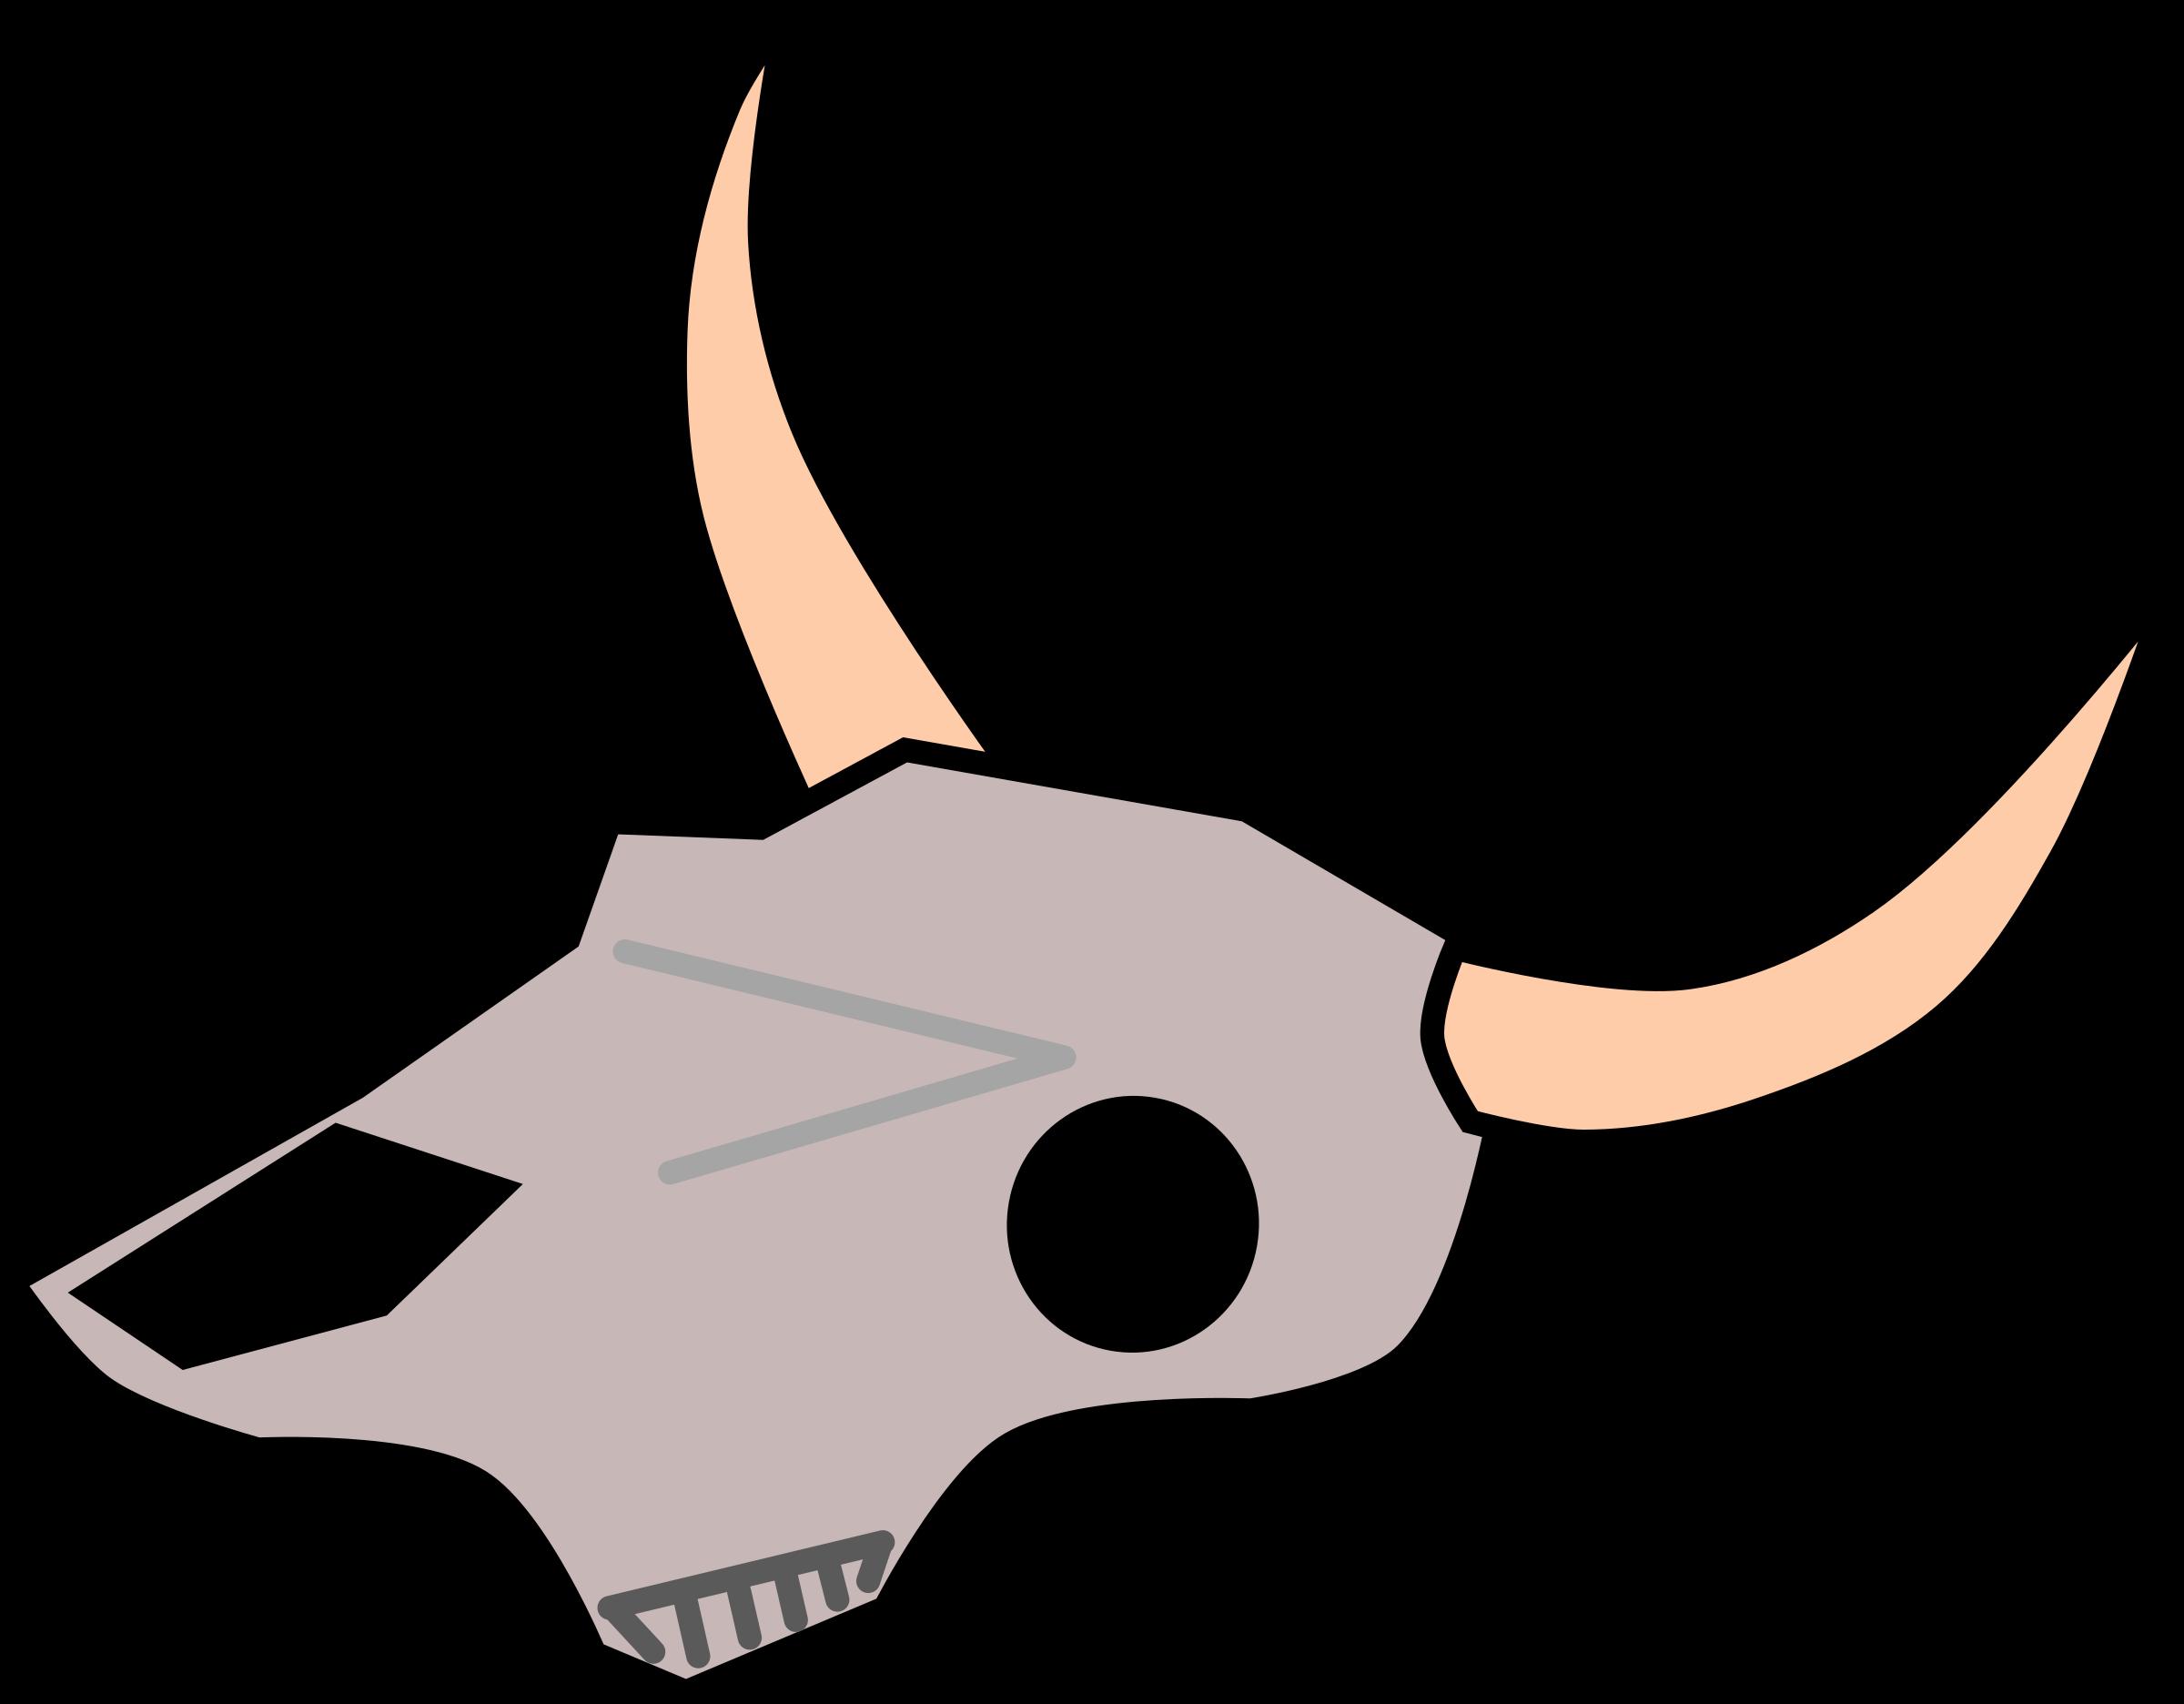 clipart cow skull rh openclipart org cow skull clipart cow skull clip art free